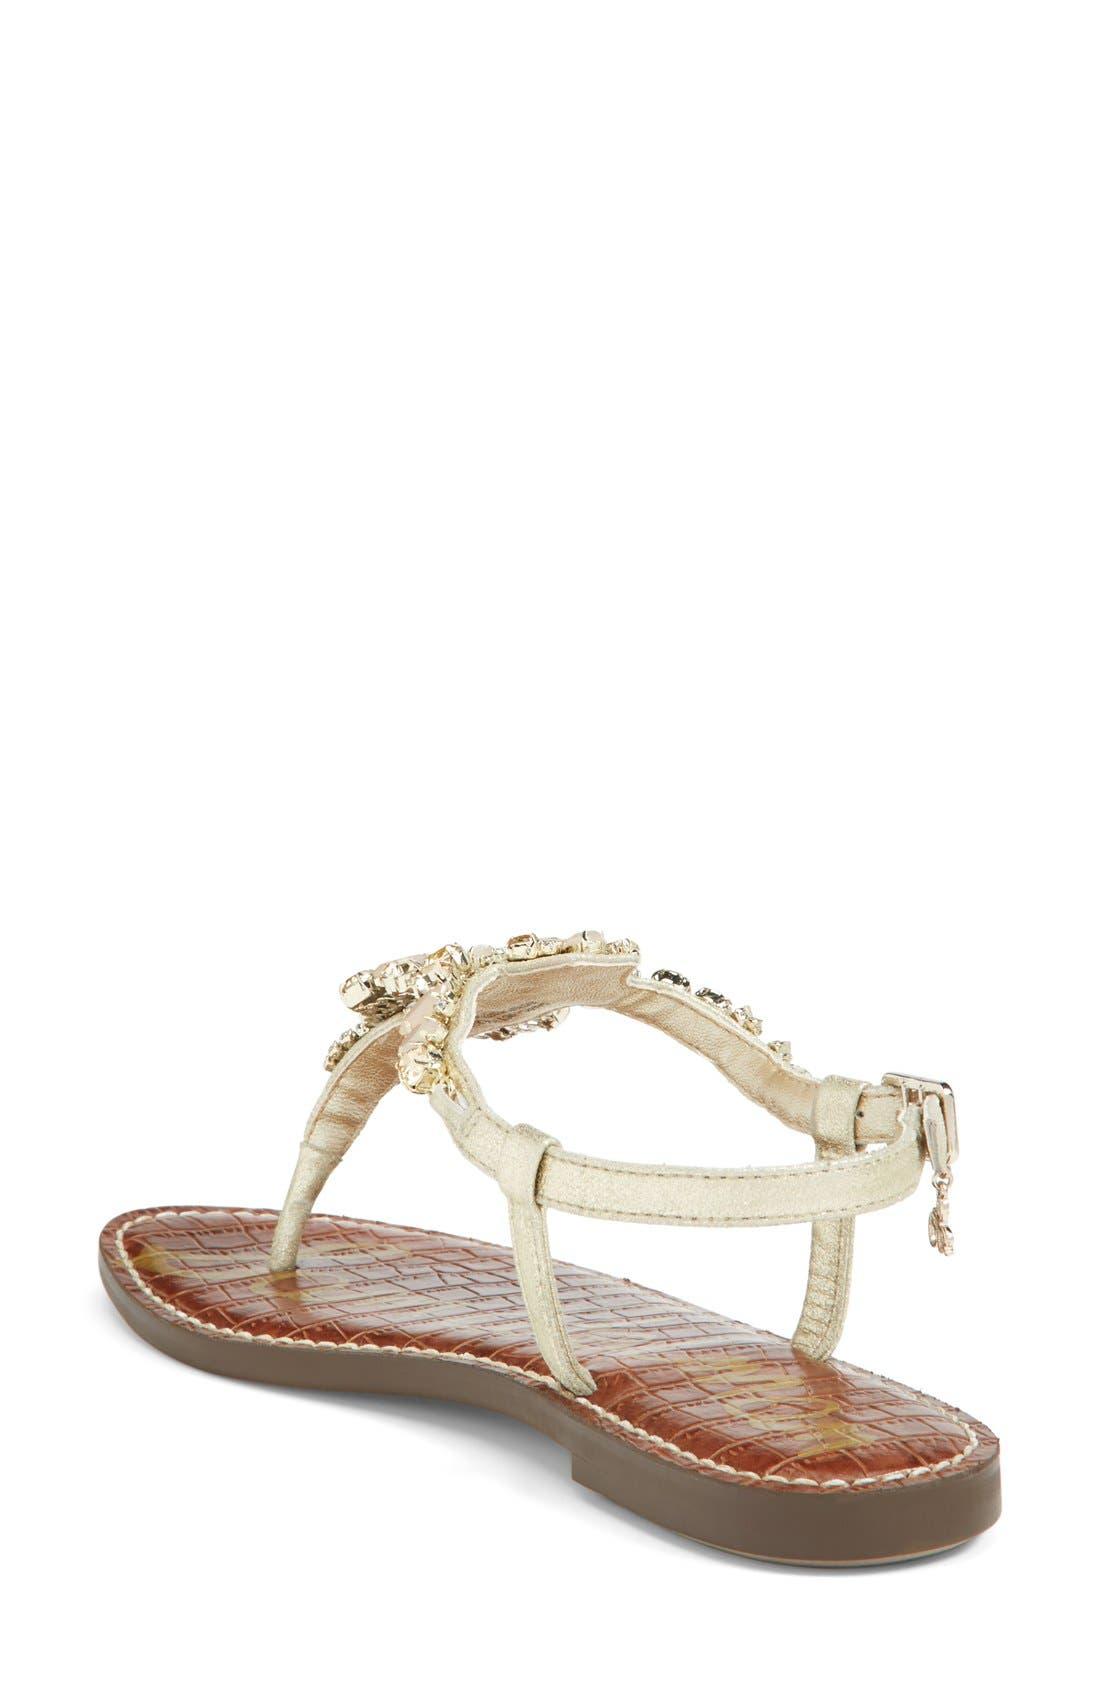 Alternate Image 2  - Sam Edelman 'Dayton' Embellished Sandal (Women)